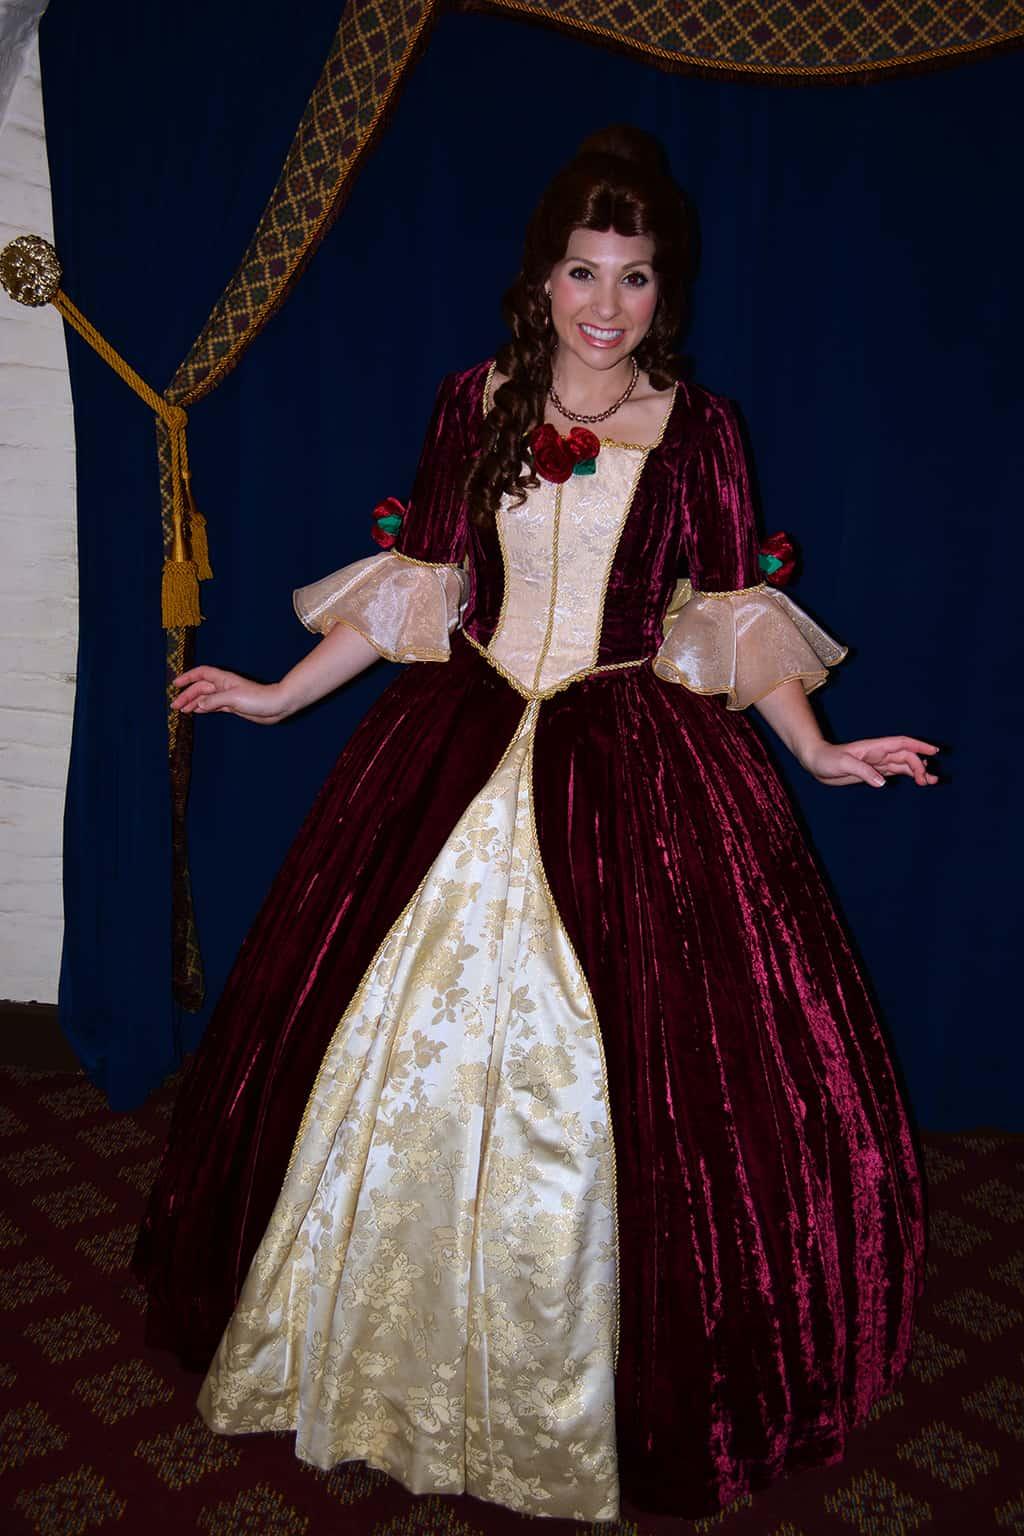 Belle in Red Dress at Epcot's France Pavilion